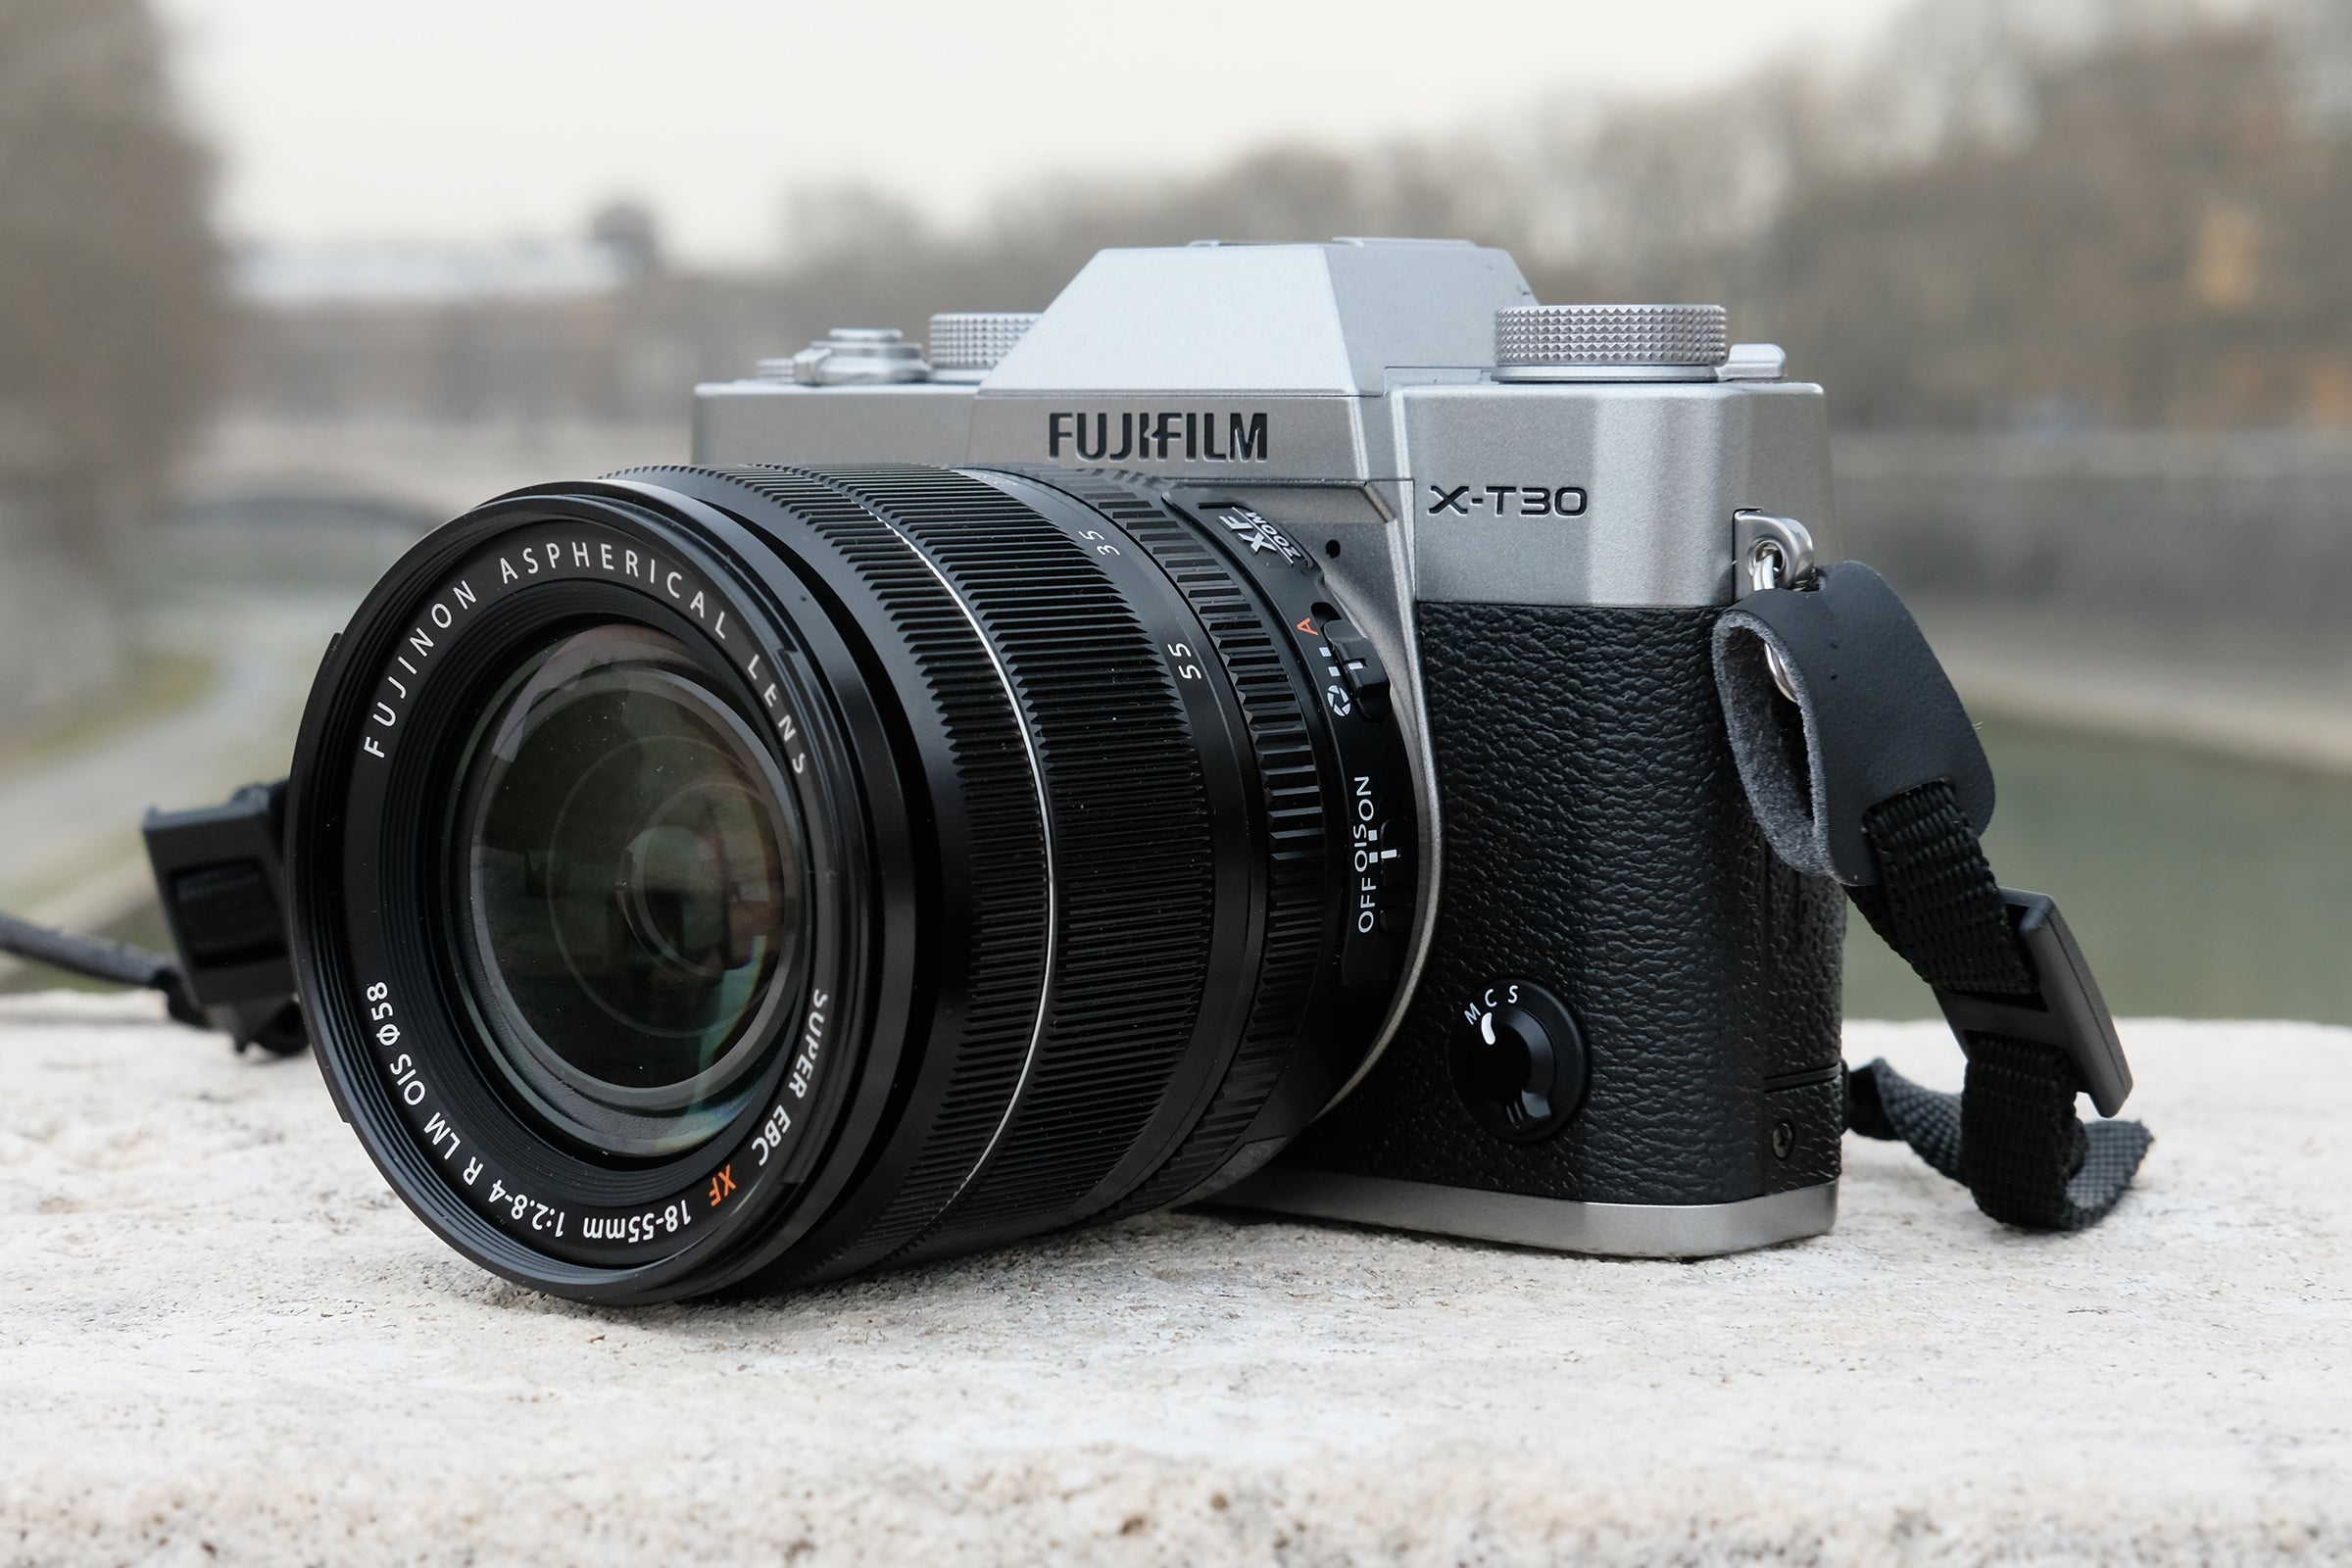 Fujifilm X-T30 review: the best sub-£1,000 camera?